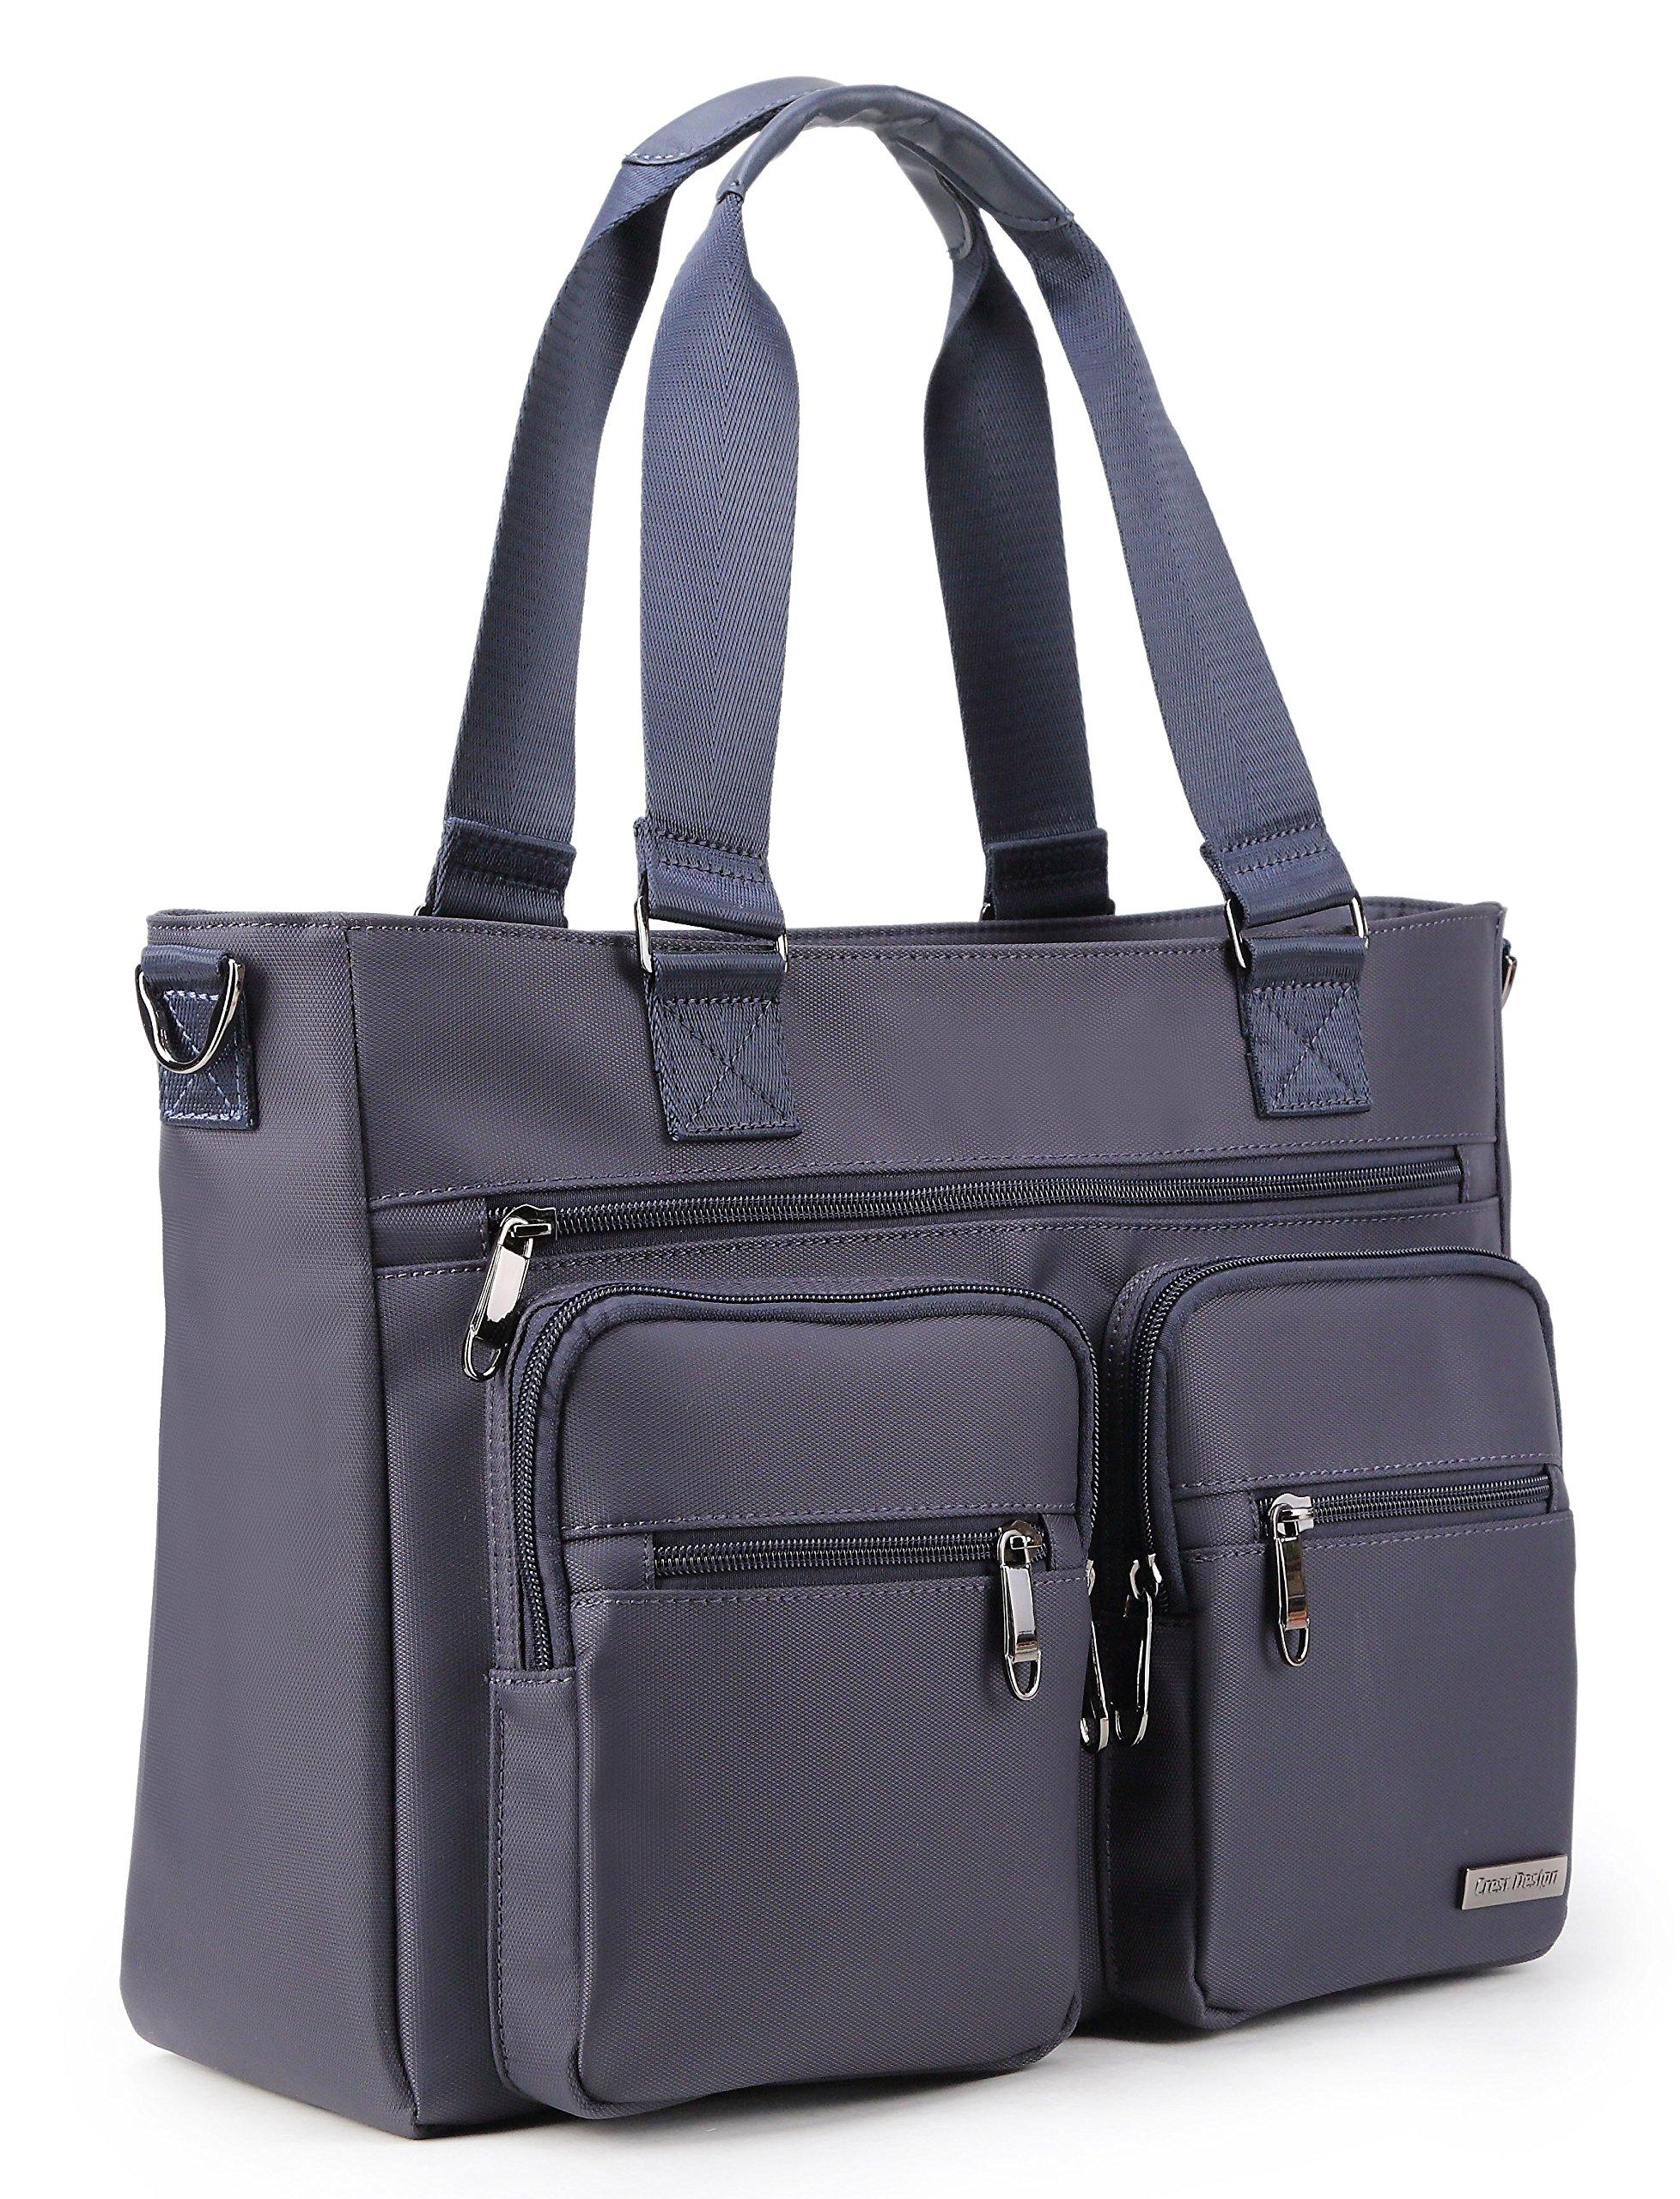 Crest Design Water Repellent Nylon Shoulder Bag Handbag Tablet Laptop Tote as Travel Work and School Bag. Perfect Nursing Tote to Carry Medical, Nursing Supplies (Navy)